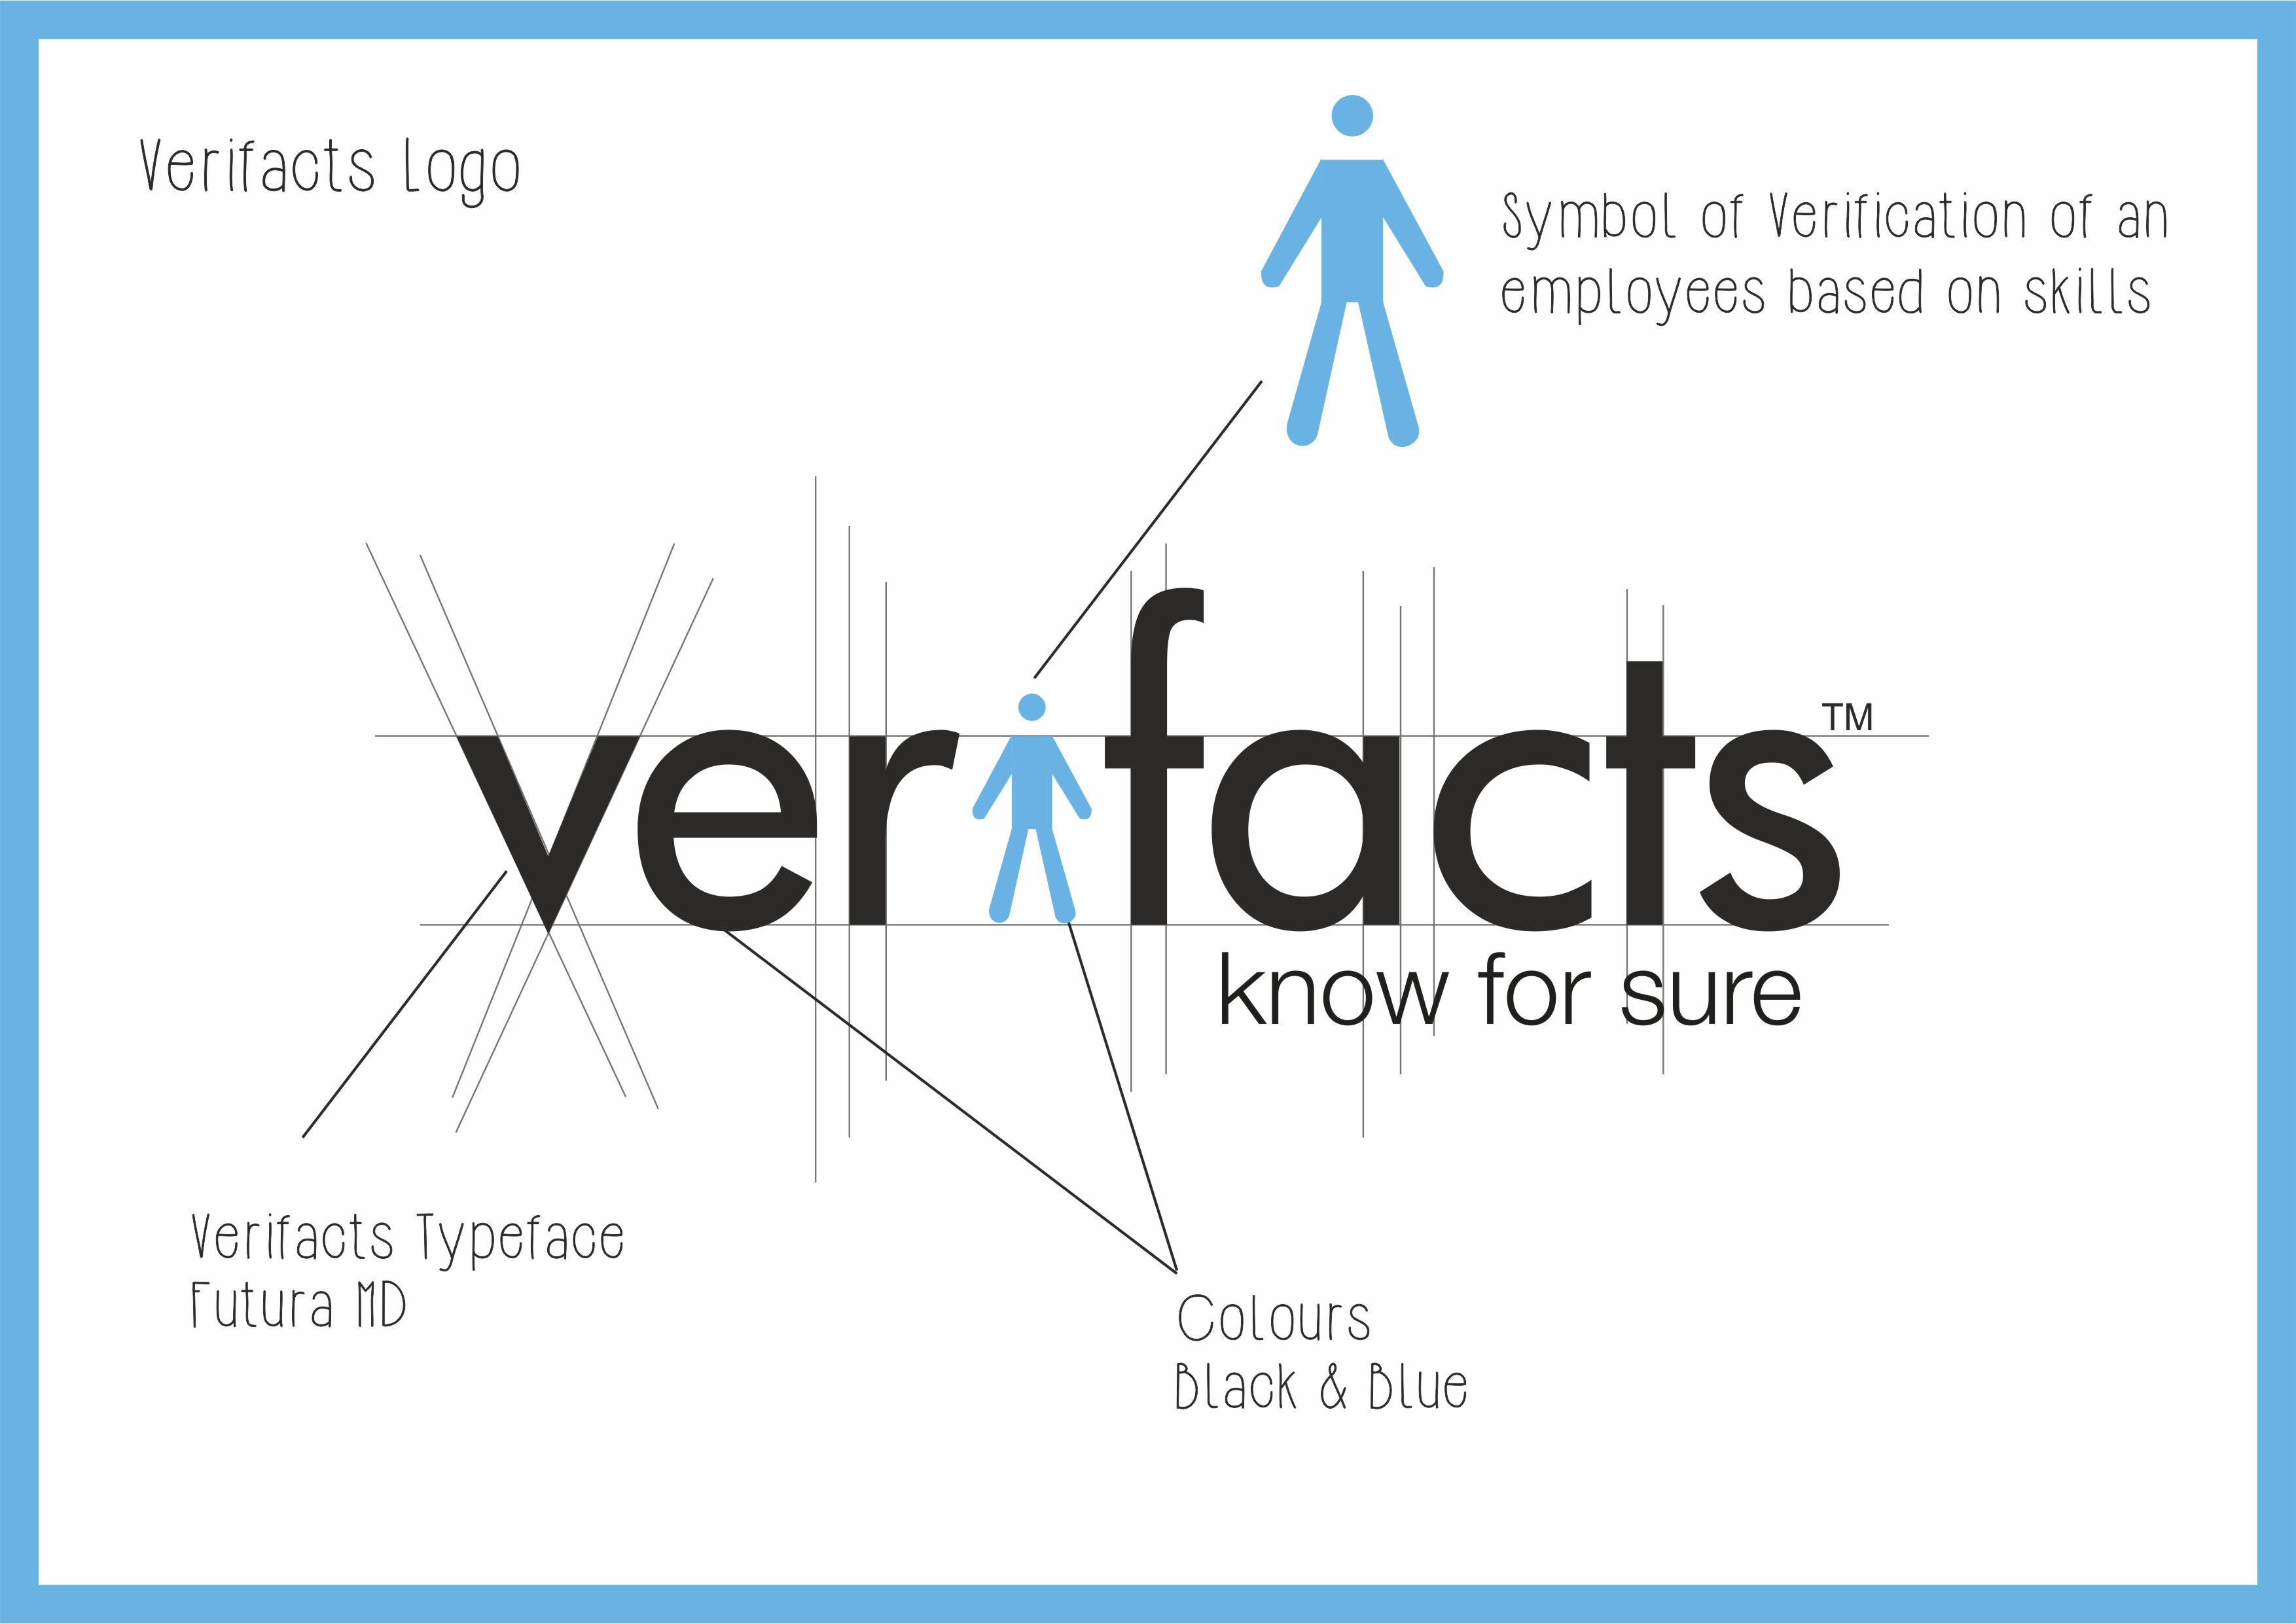 Verifacts BGV Logo explanation